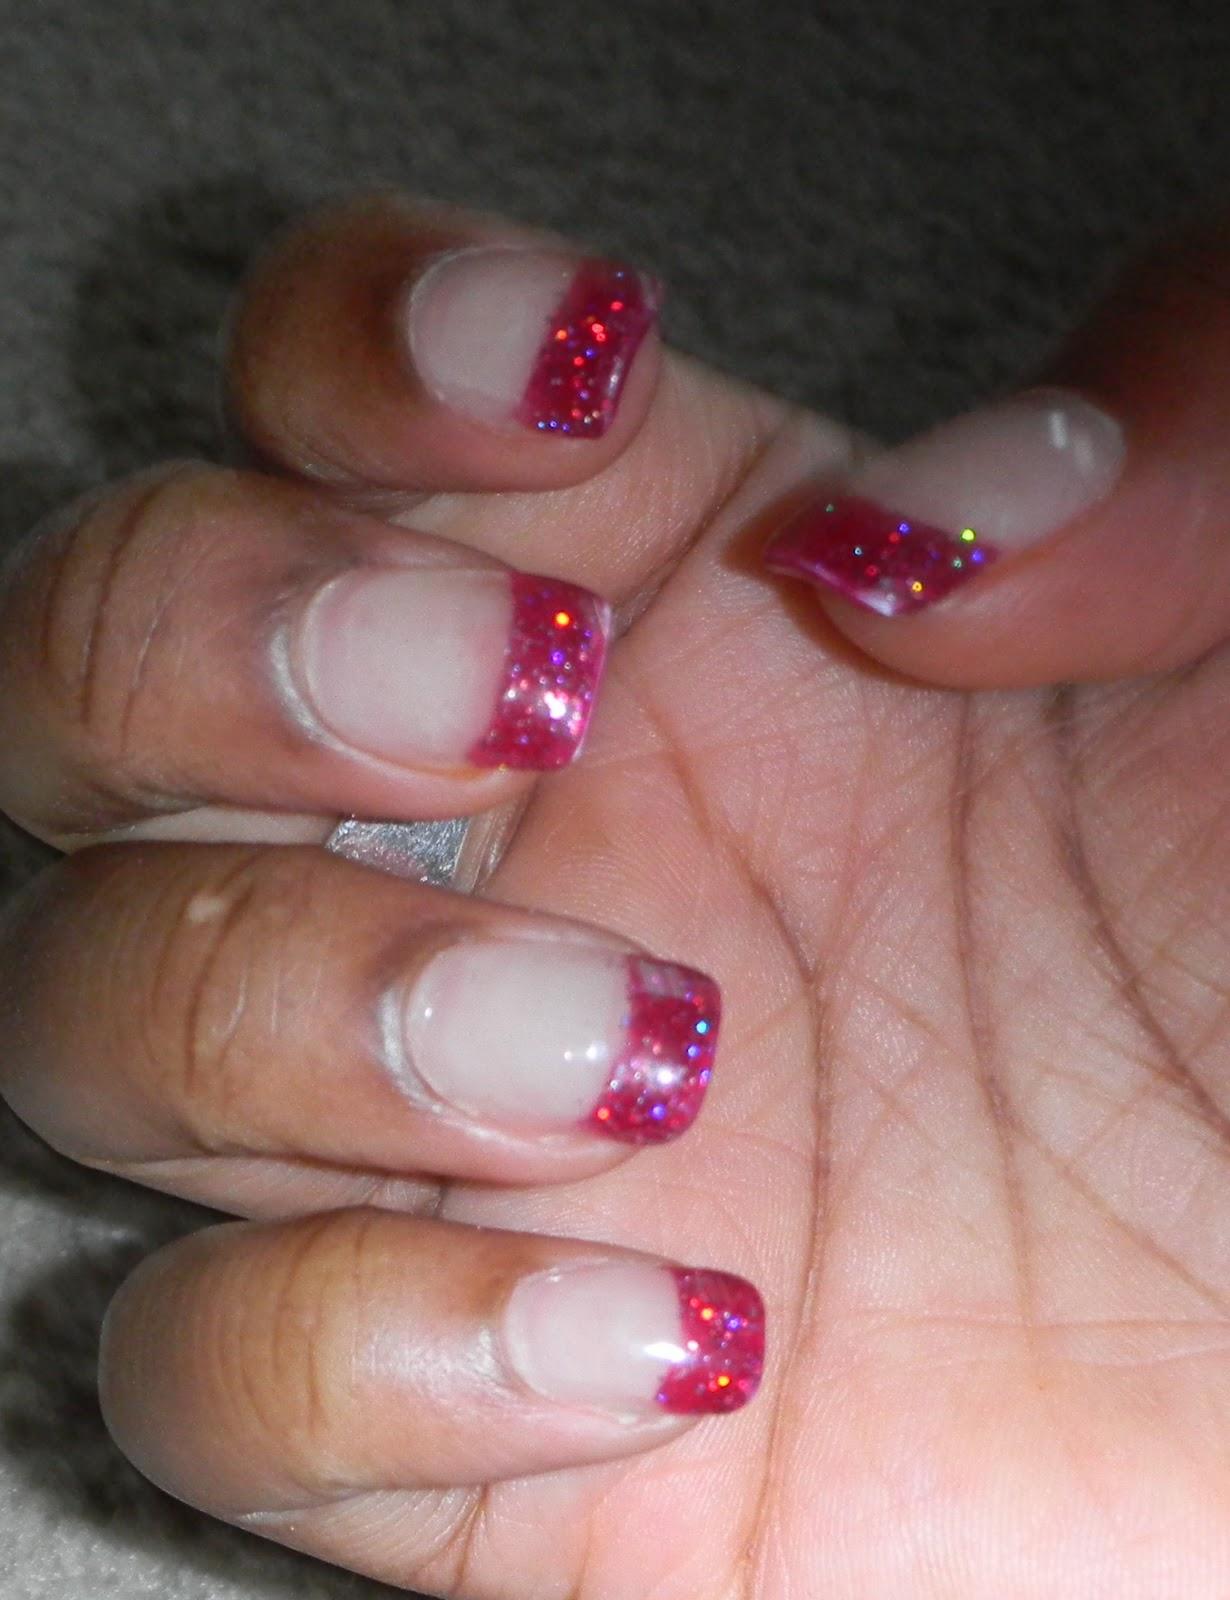 http://1.bp.blogspot.com/-rkftyu7dN_s/TrmRdLEbdAI/AAAAAAAAF9Q/SIbR3Rlk3tk/s1600/glitter+tips.jpg